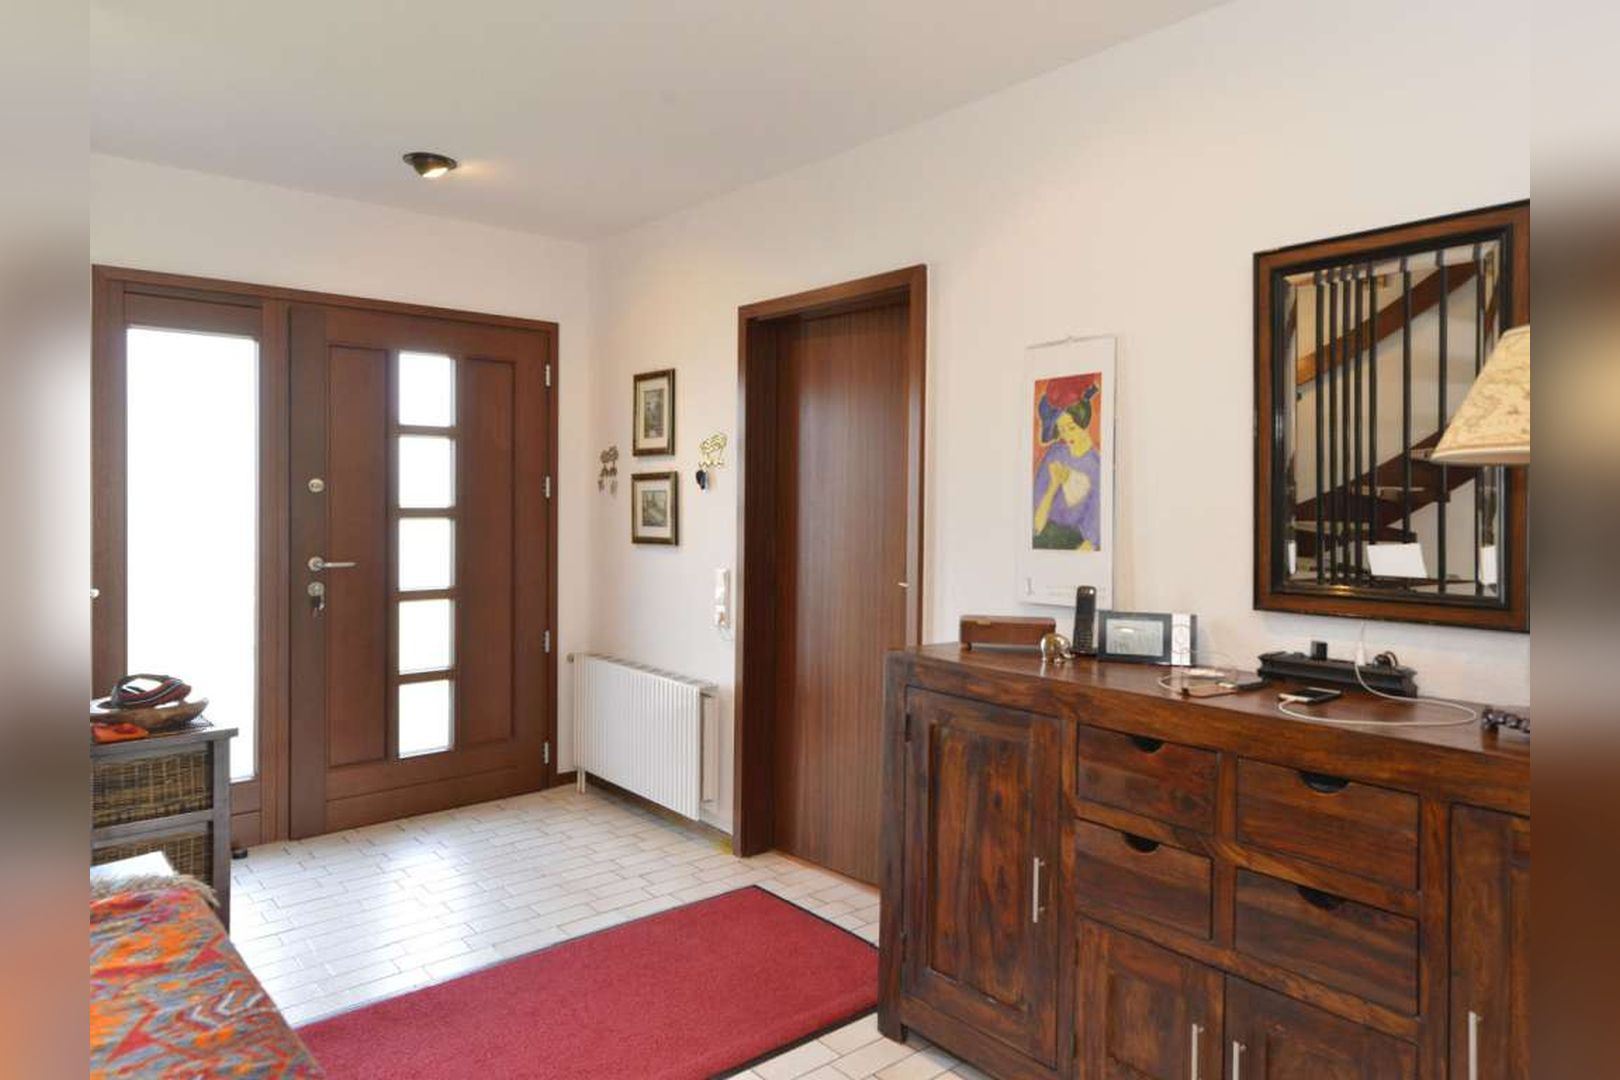 Immobilie Nr.0254 - Doppelhaushälfte rechtsbündig mit Garage & Carport  - Bild 7.jpg